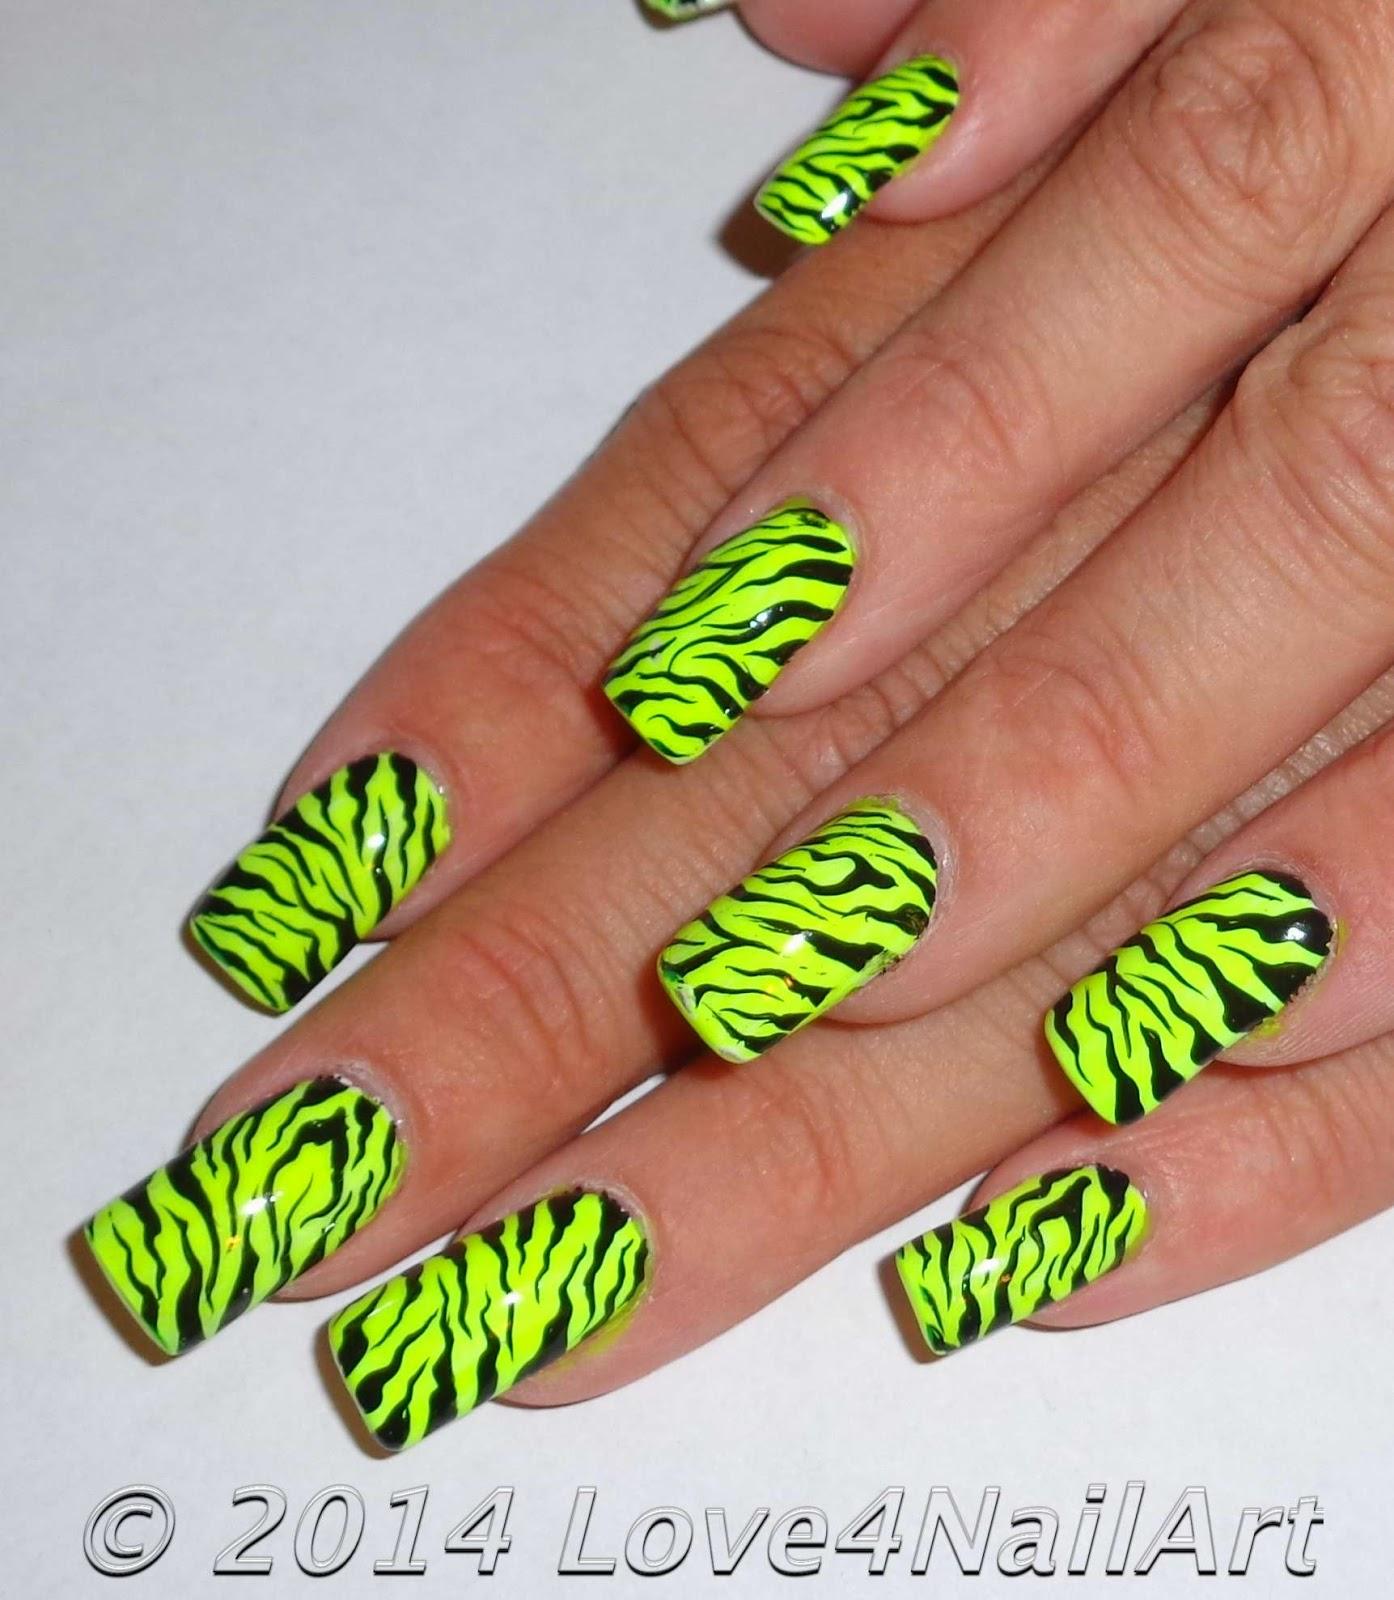 Love4NailArt Neon Yellow Zebra Nails (seen a mile away!)